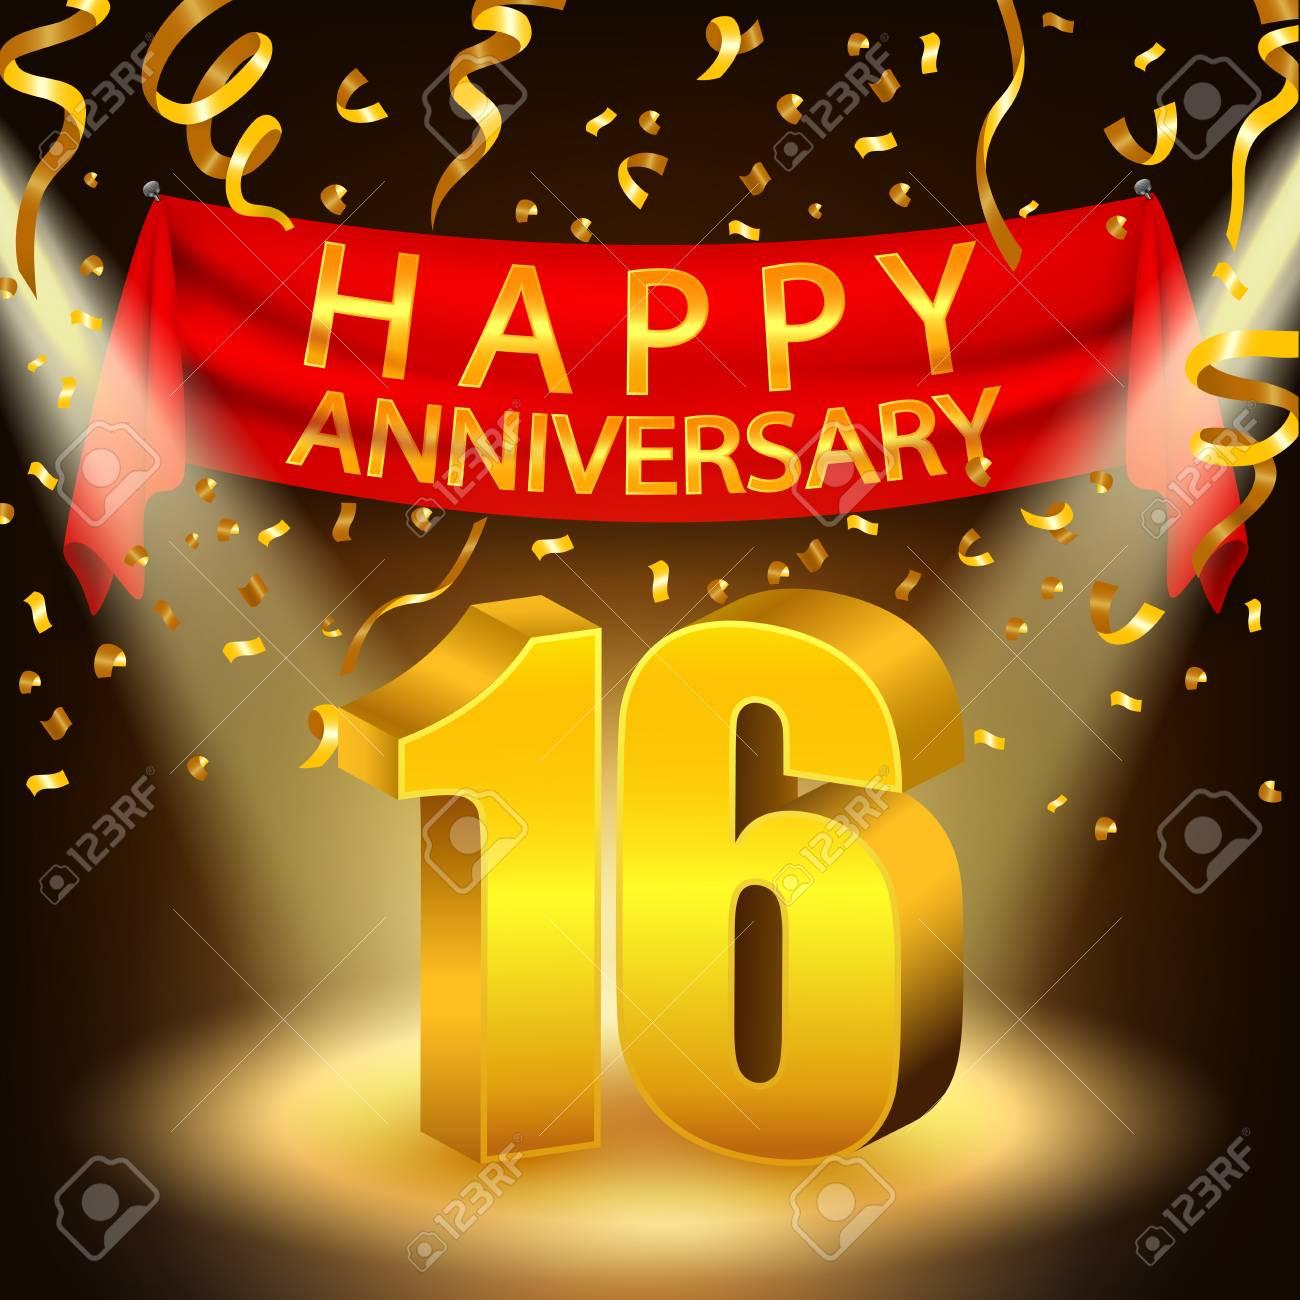 Happy 16th Anniversary Celebration With Golden Confetti And